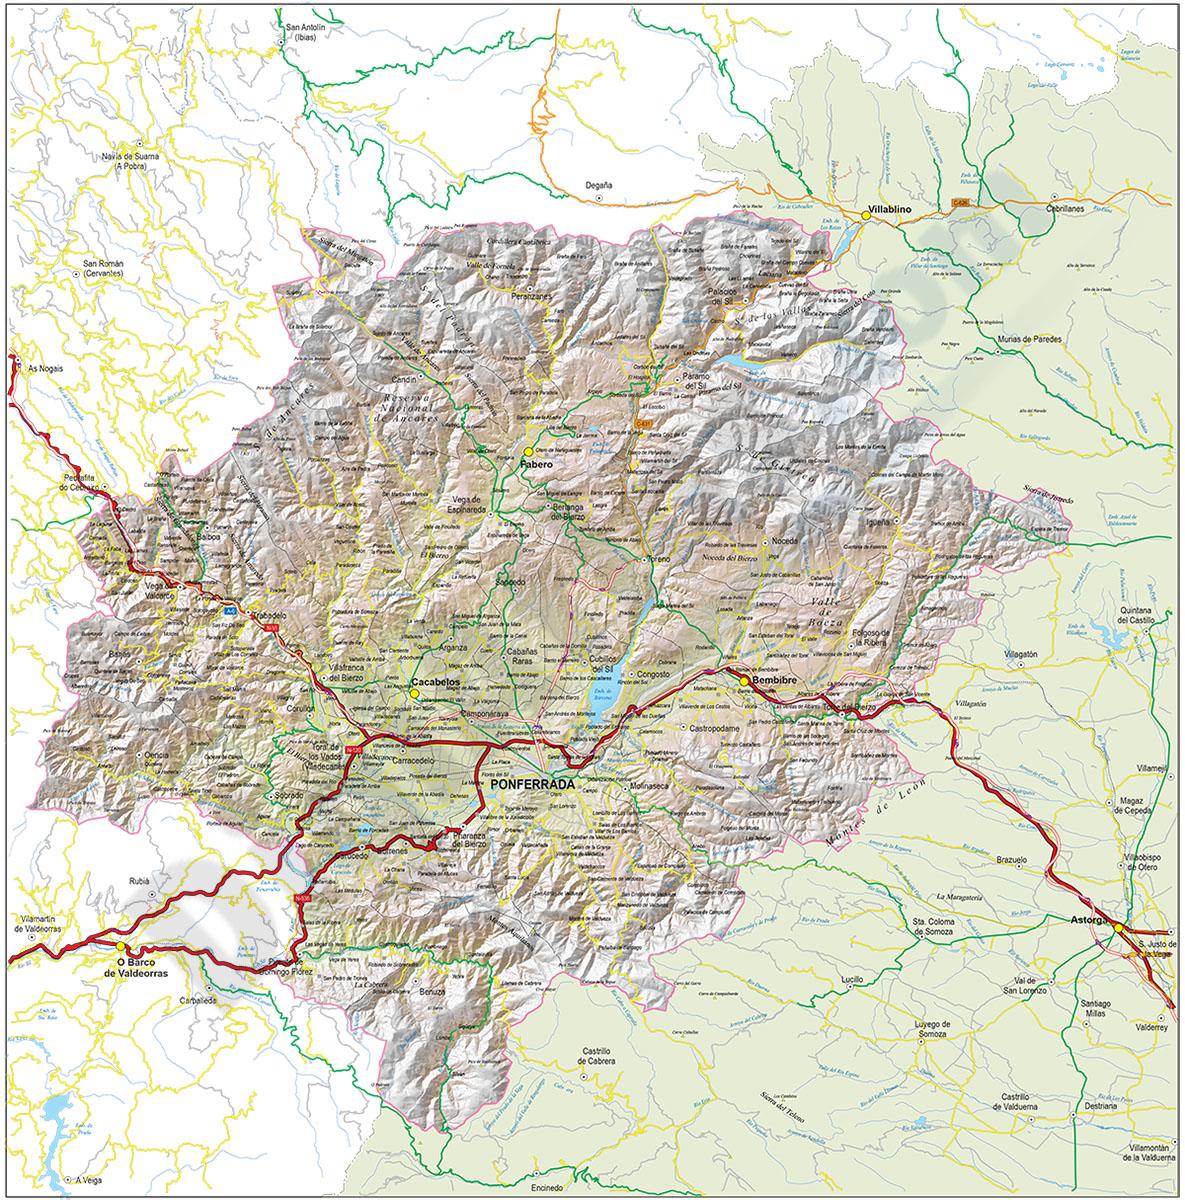 El Bierzo - Map of the Comarca (province of Leon, Spain)